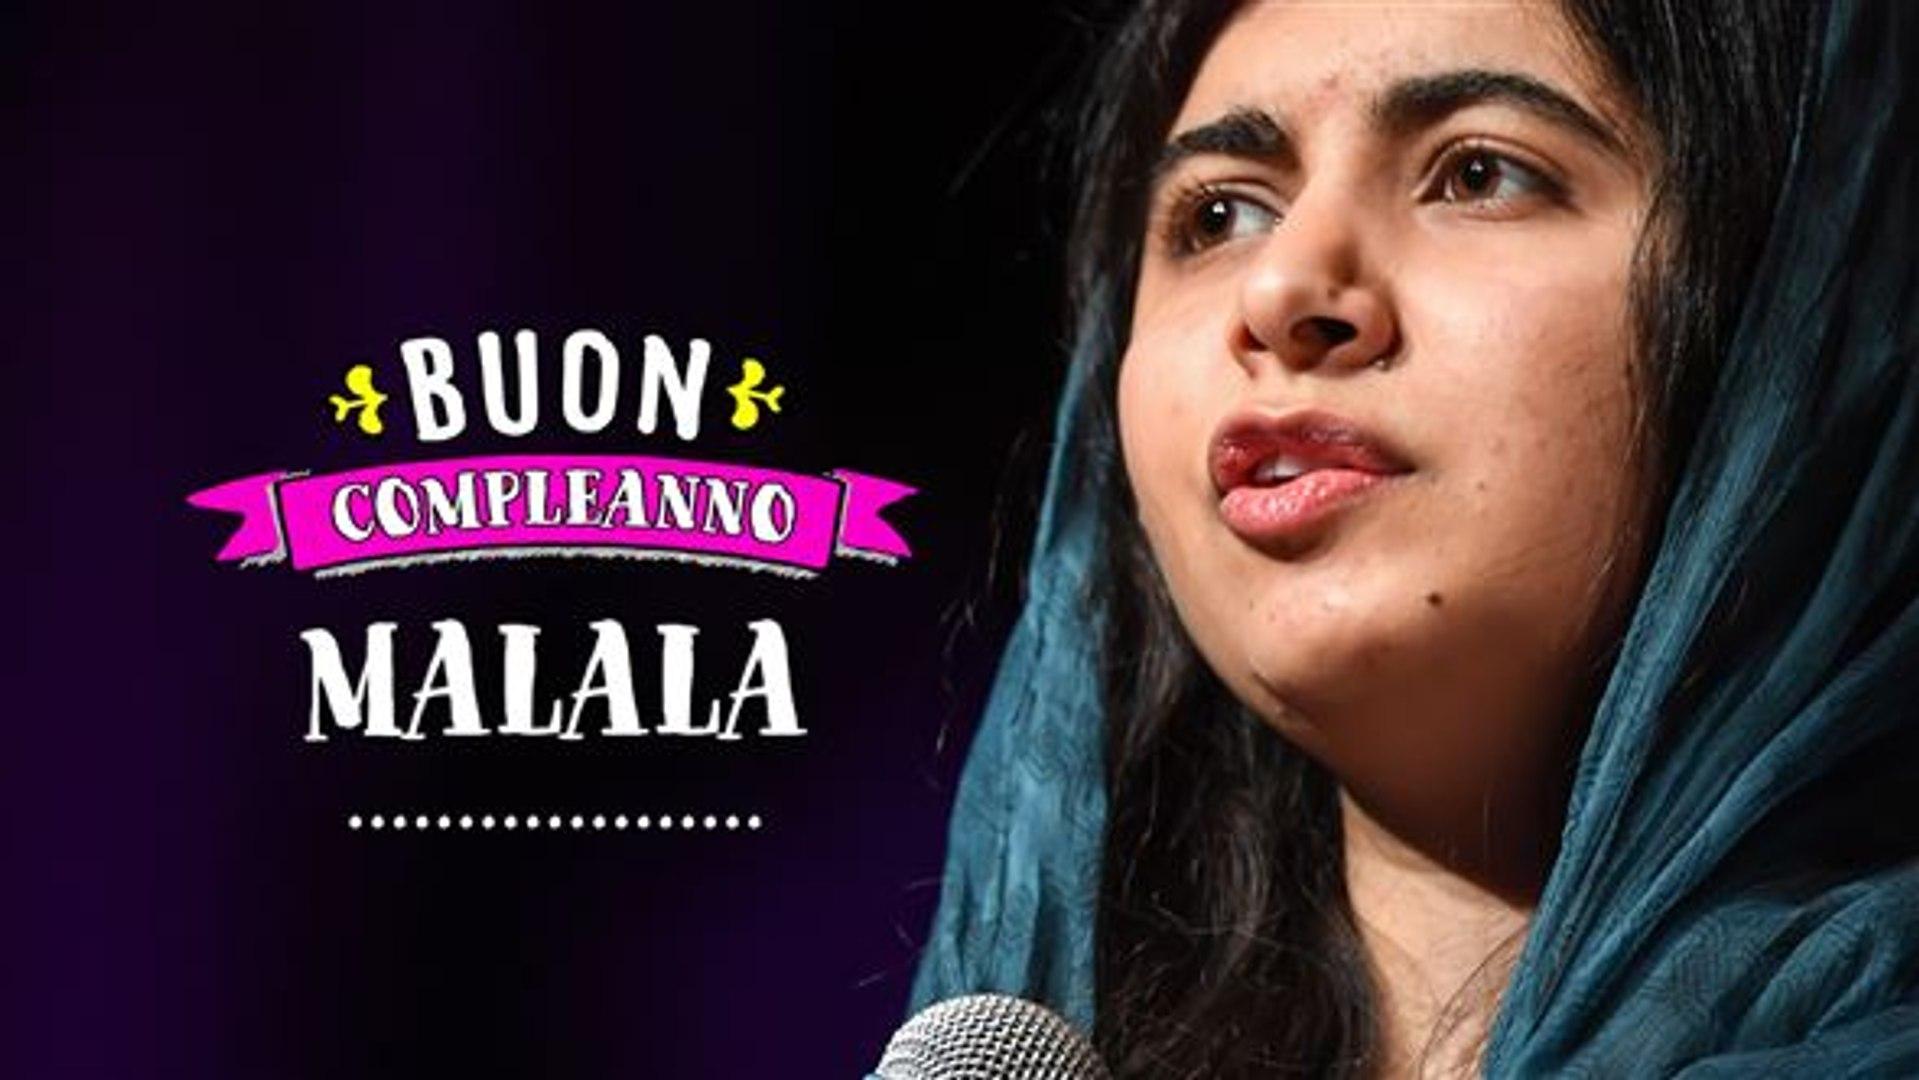 Frasi Di Malala Yousafzai Miglior Frase Impostata In Hd